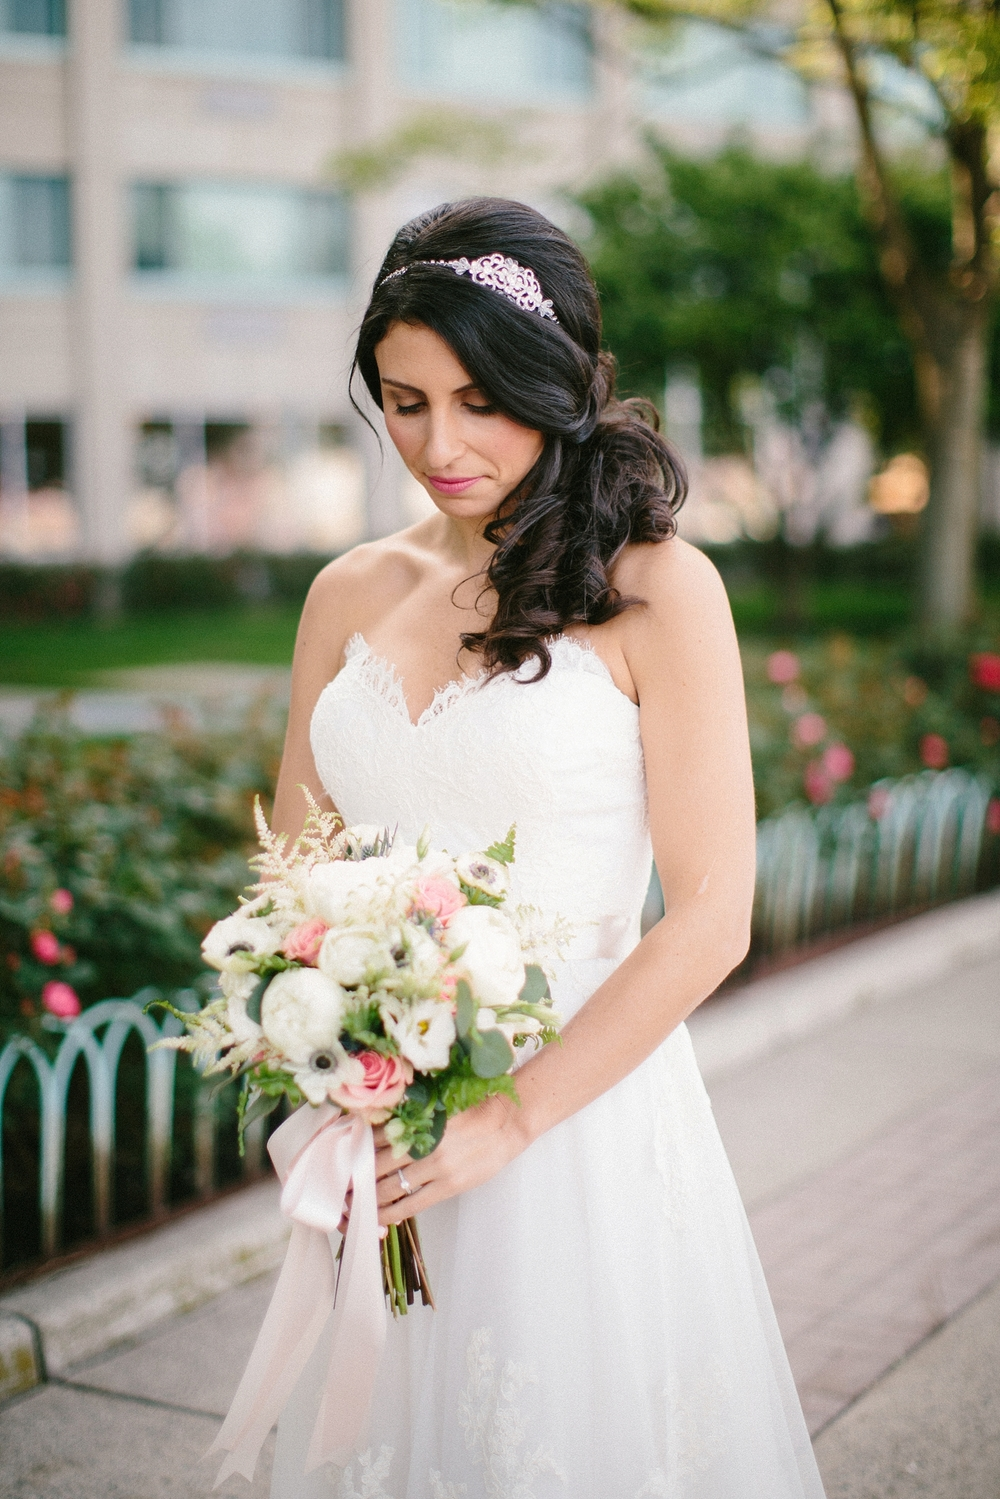 liberty-state-park-wedding-photographer-ny-nj_0017.jpg